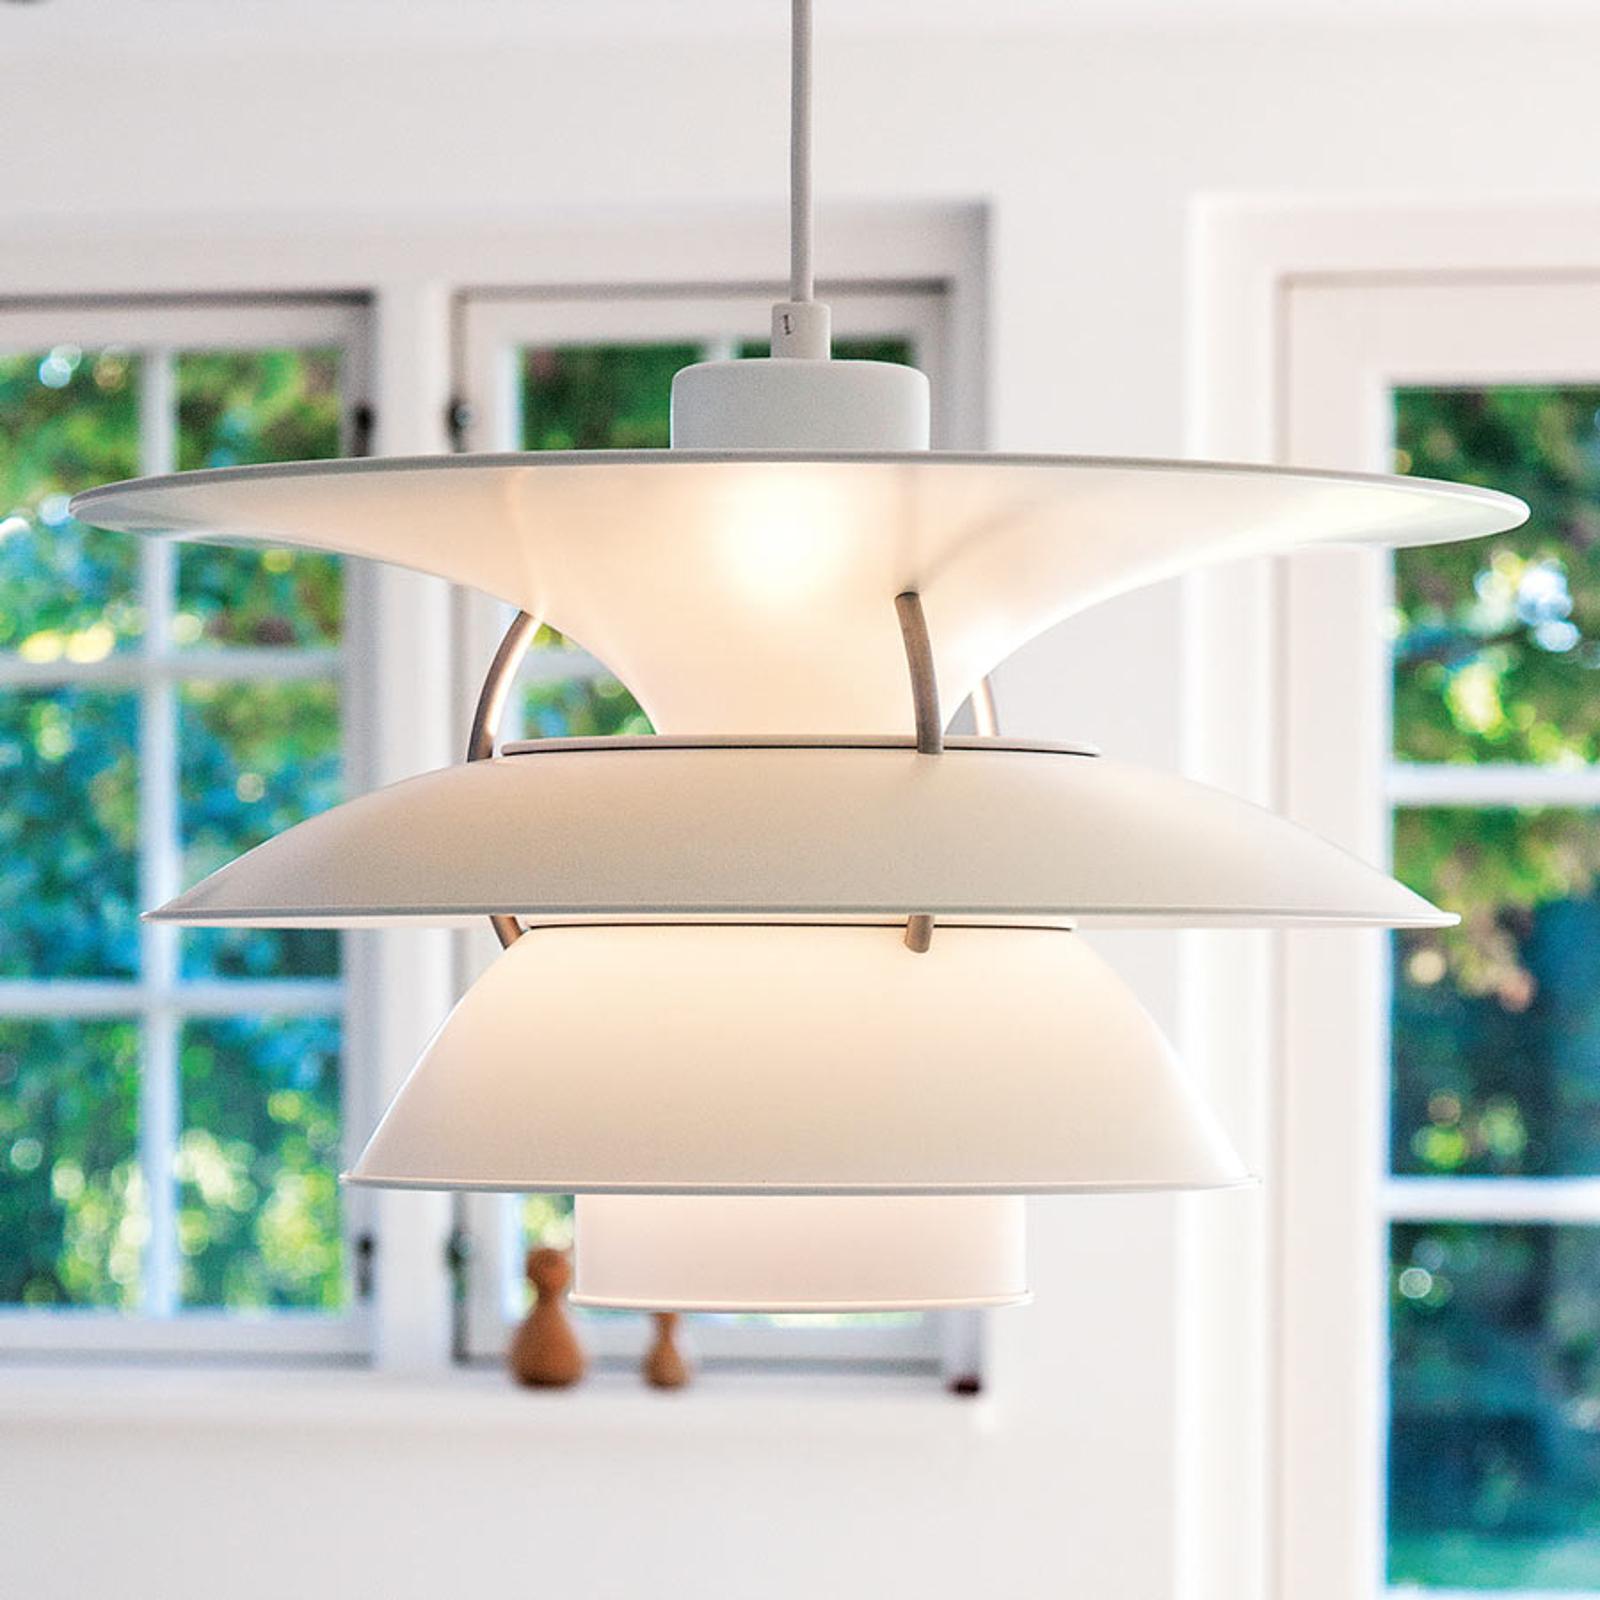 Design hanglamp PH 5-4 1/2